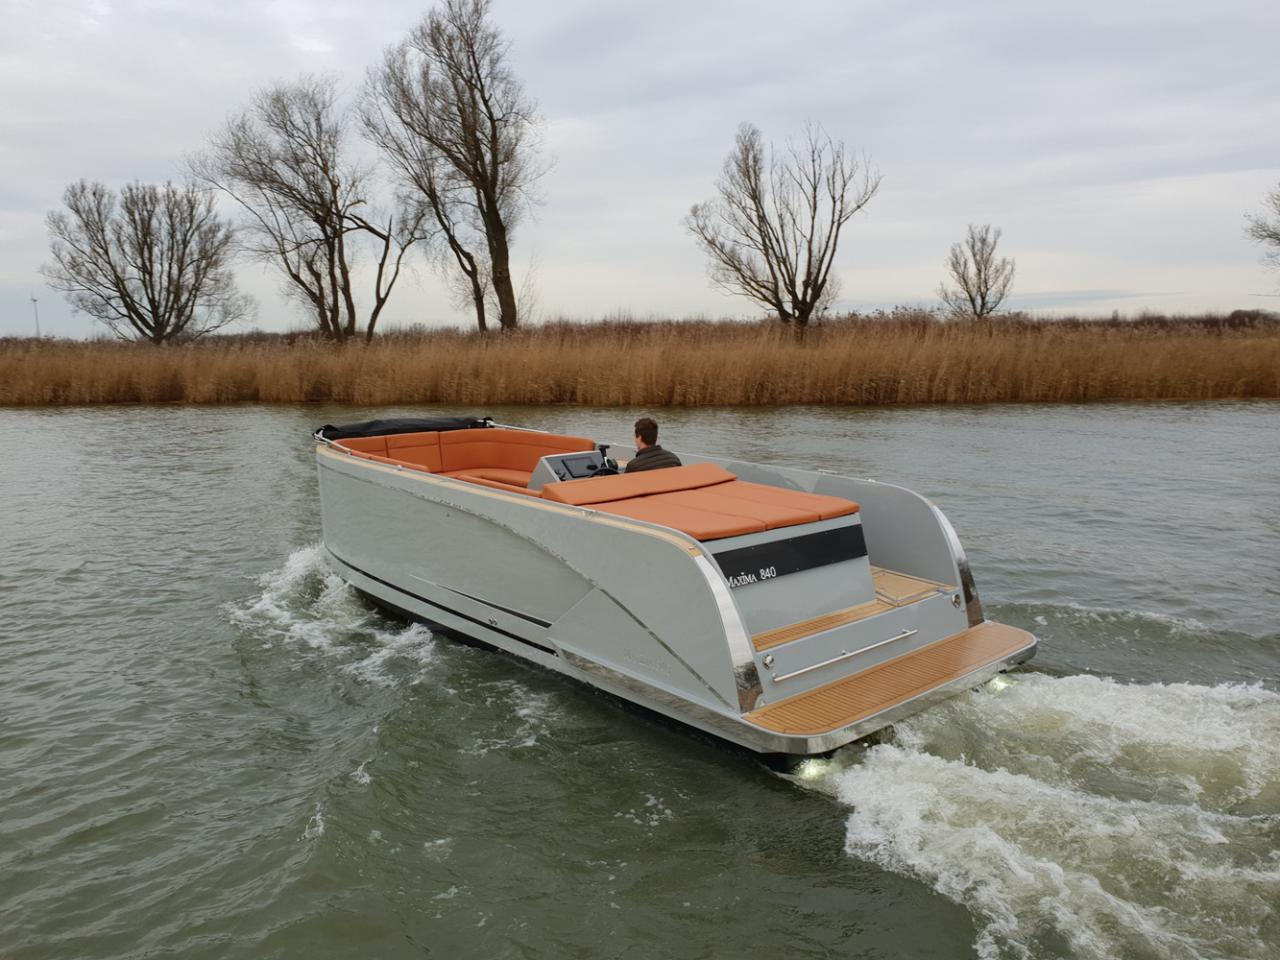 Maxima 840 tender 41